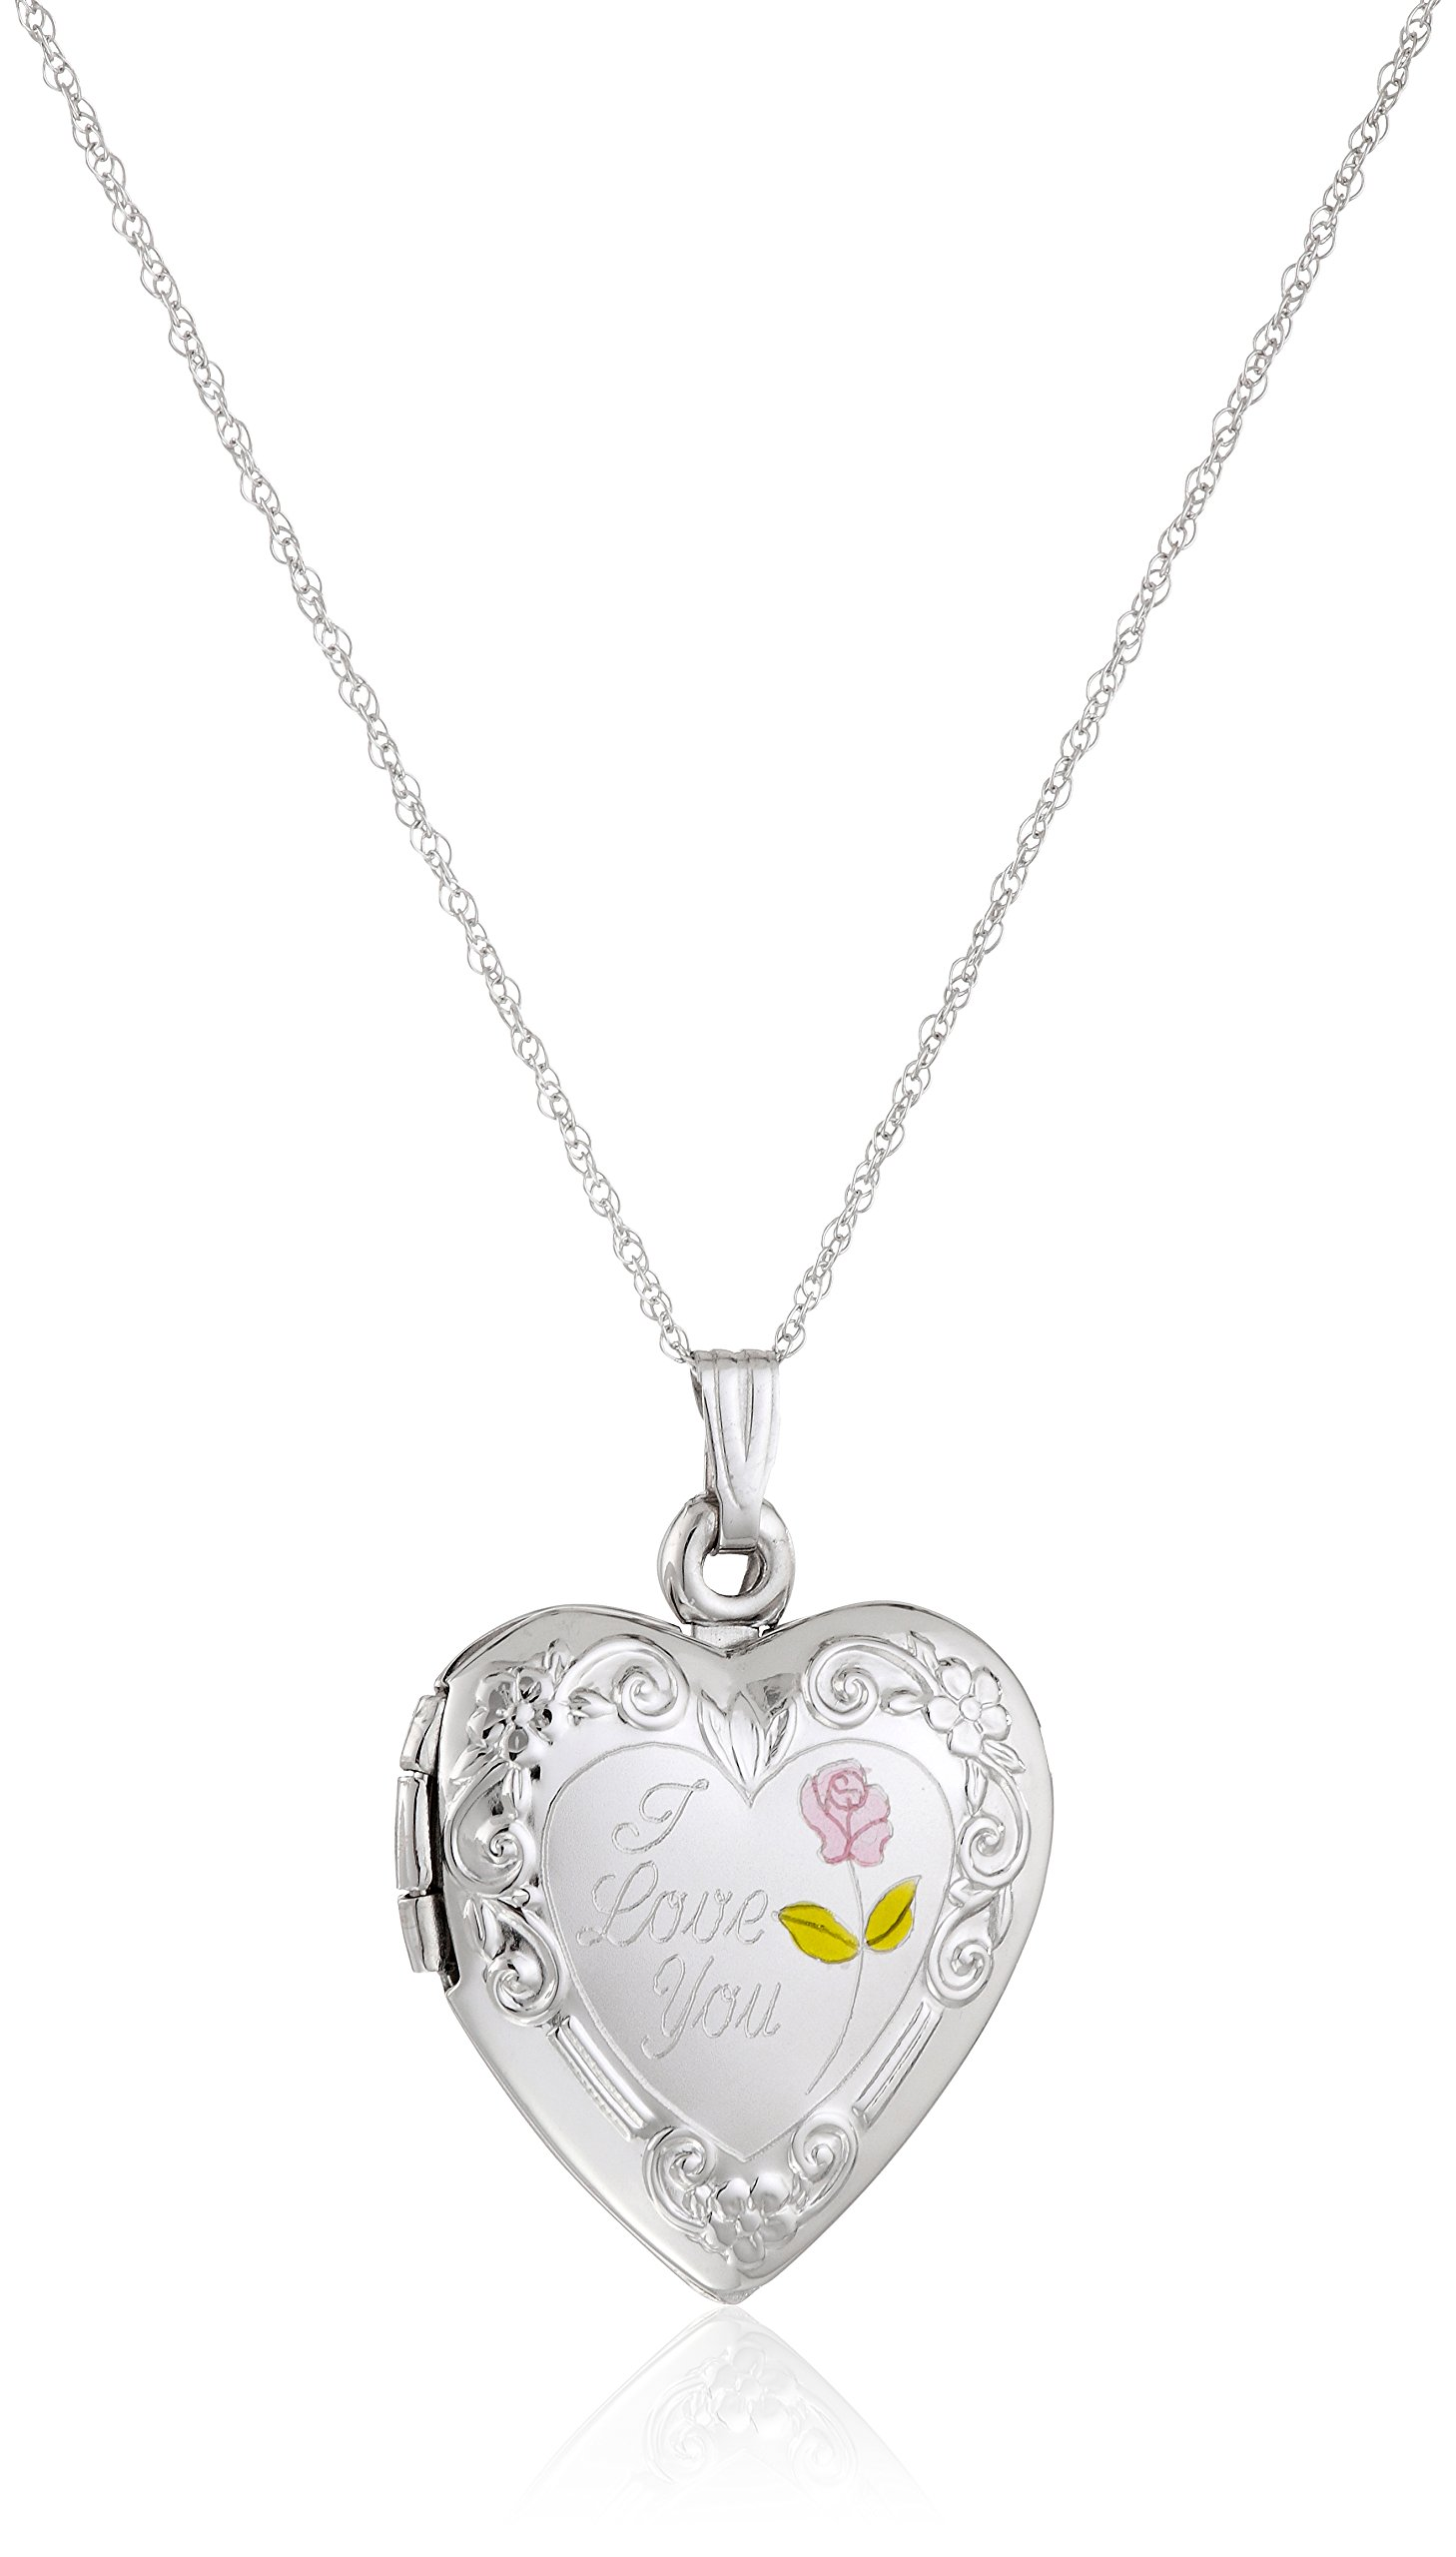 14k White Gold ''I Love You'' Heart Locket Necklace, 18''